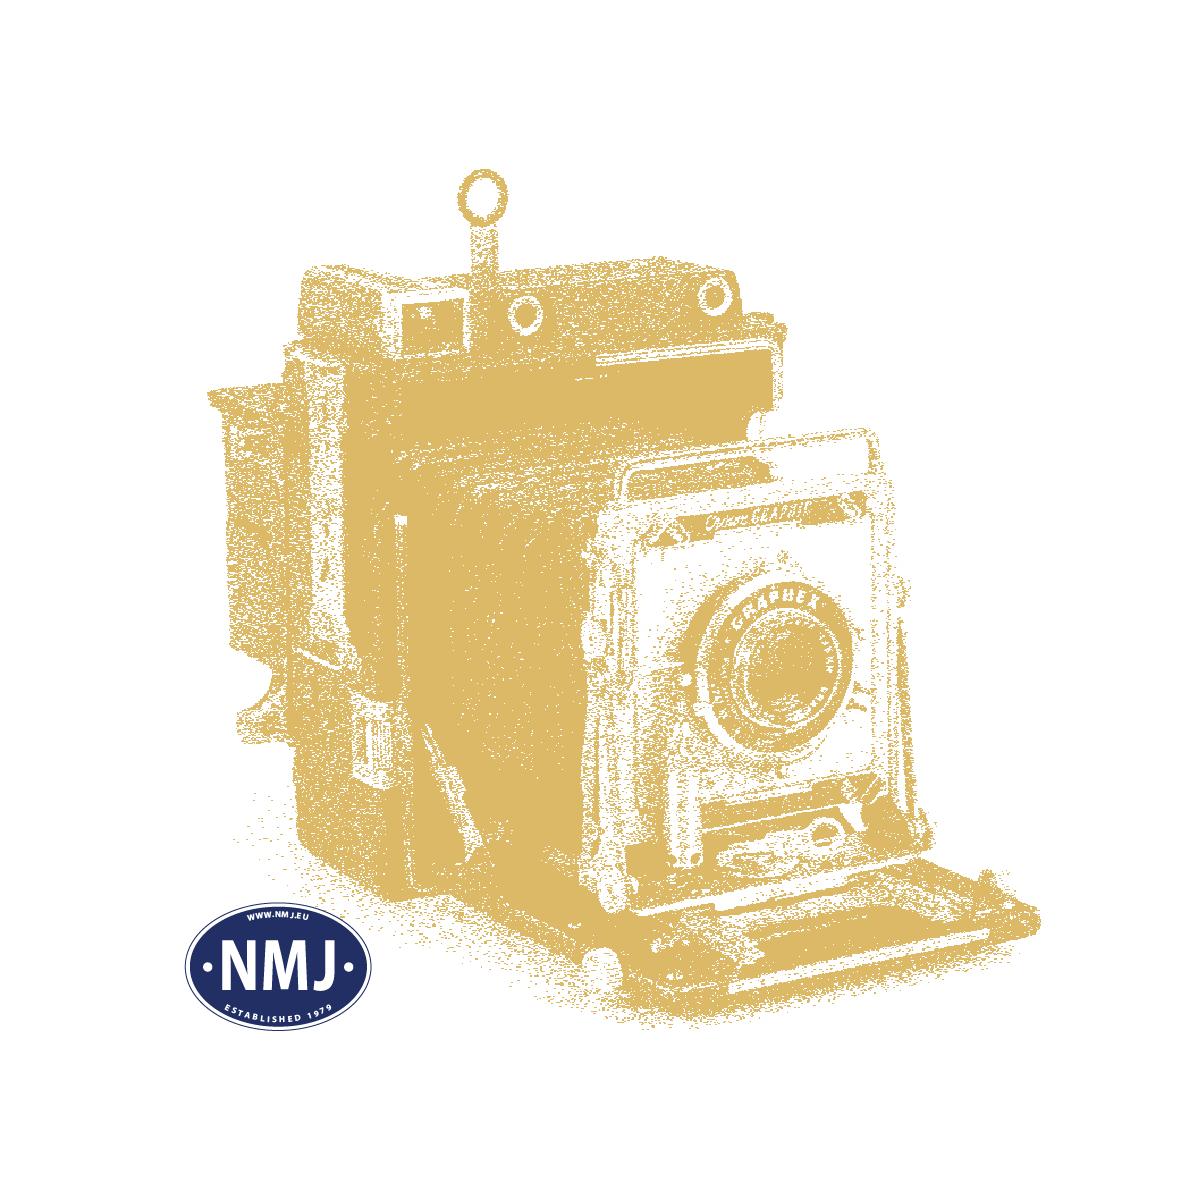 NMJT604.505 - NMJ Topline HNJ G 1613